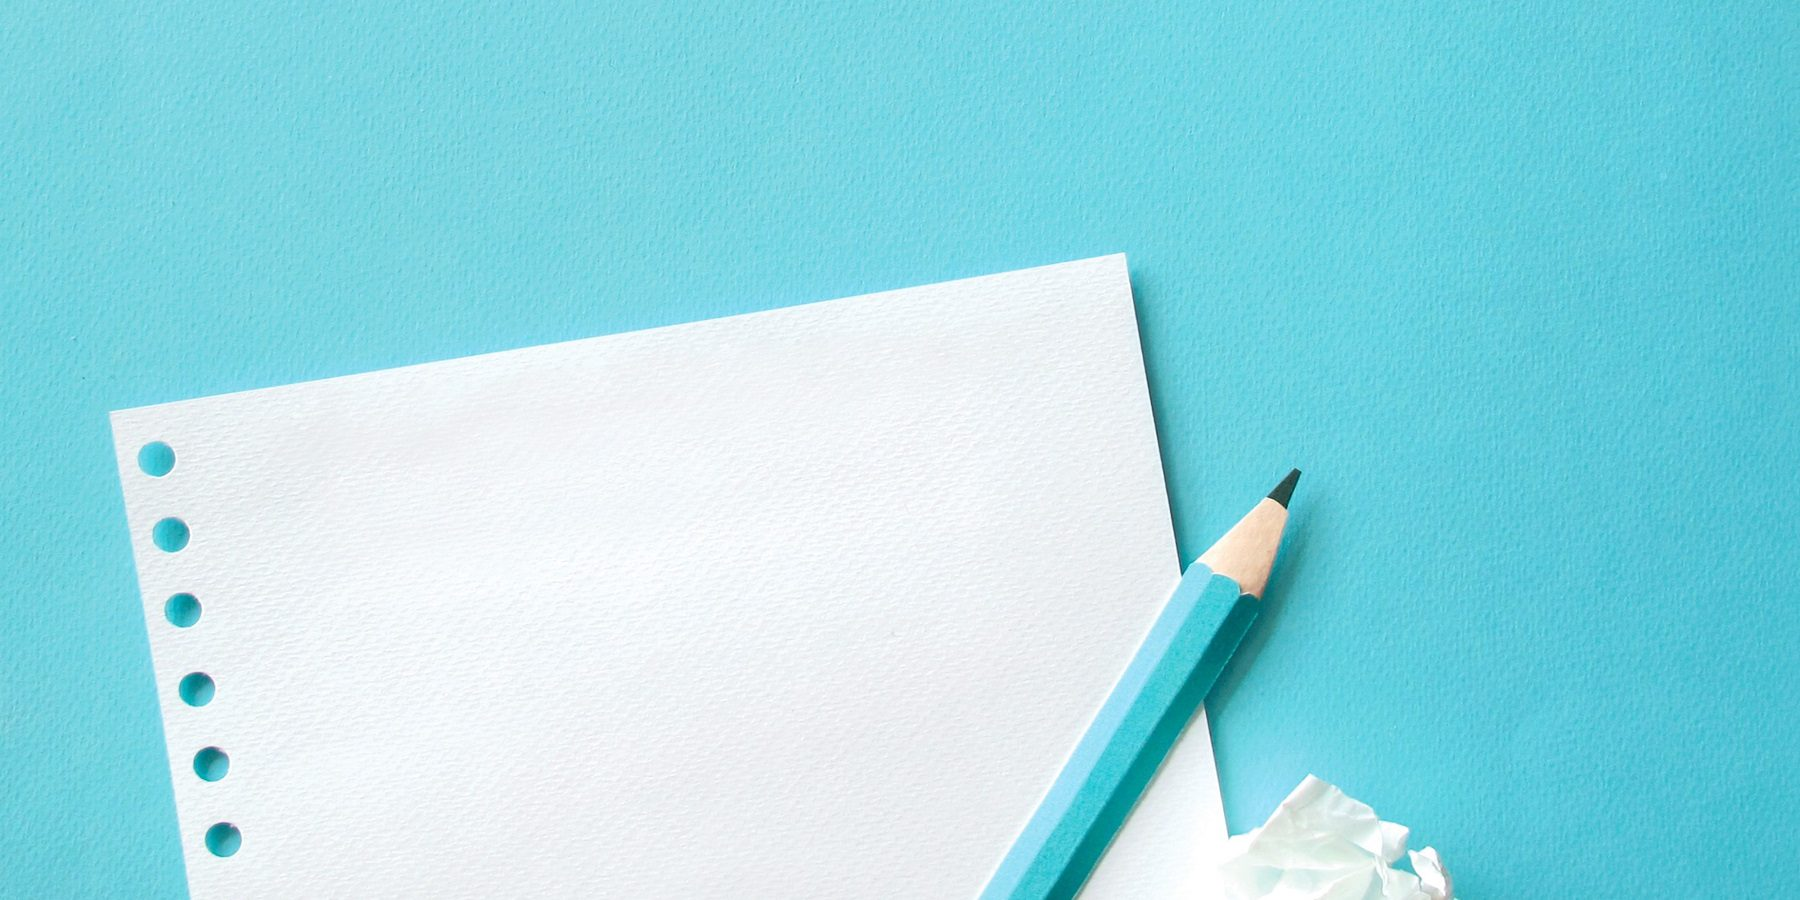 pen-paper-rawpixel-782055-unsplash